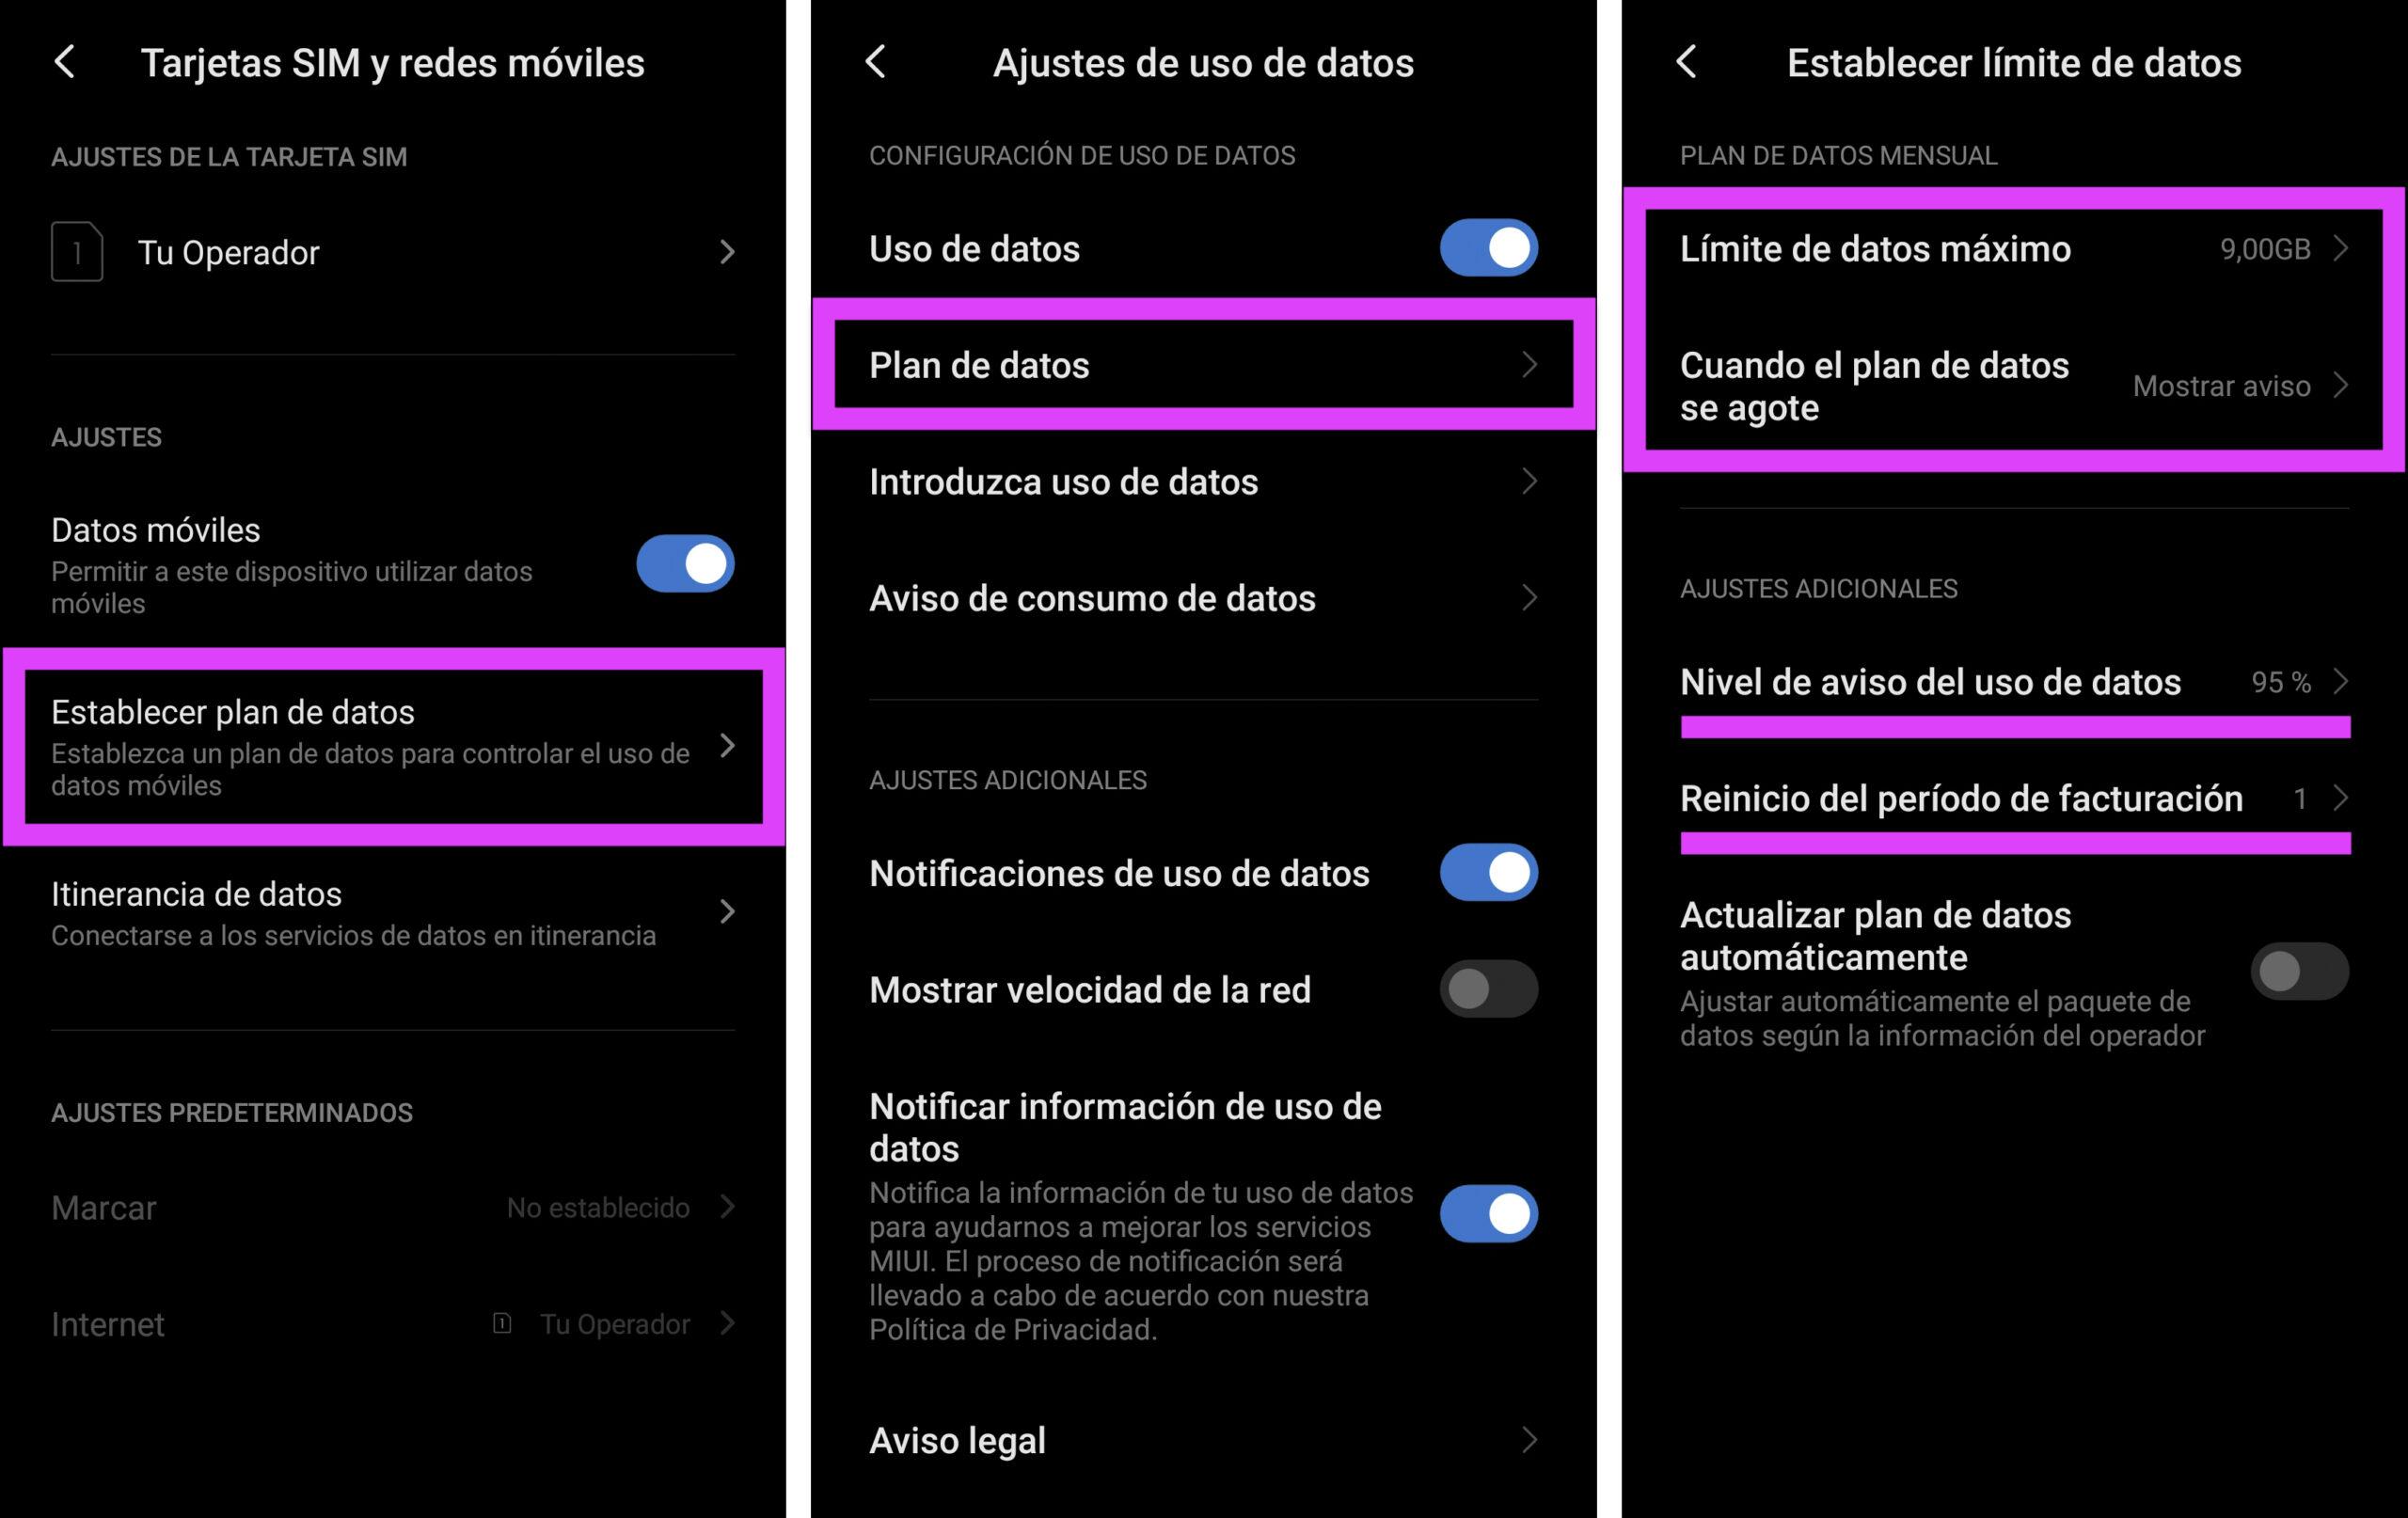 Establecer plan de datos mensual en Android